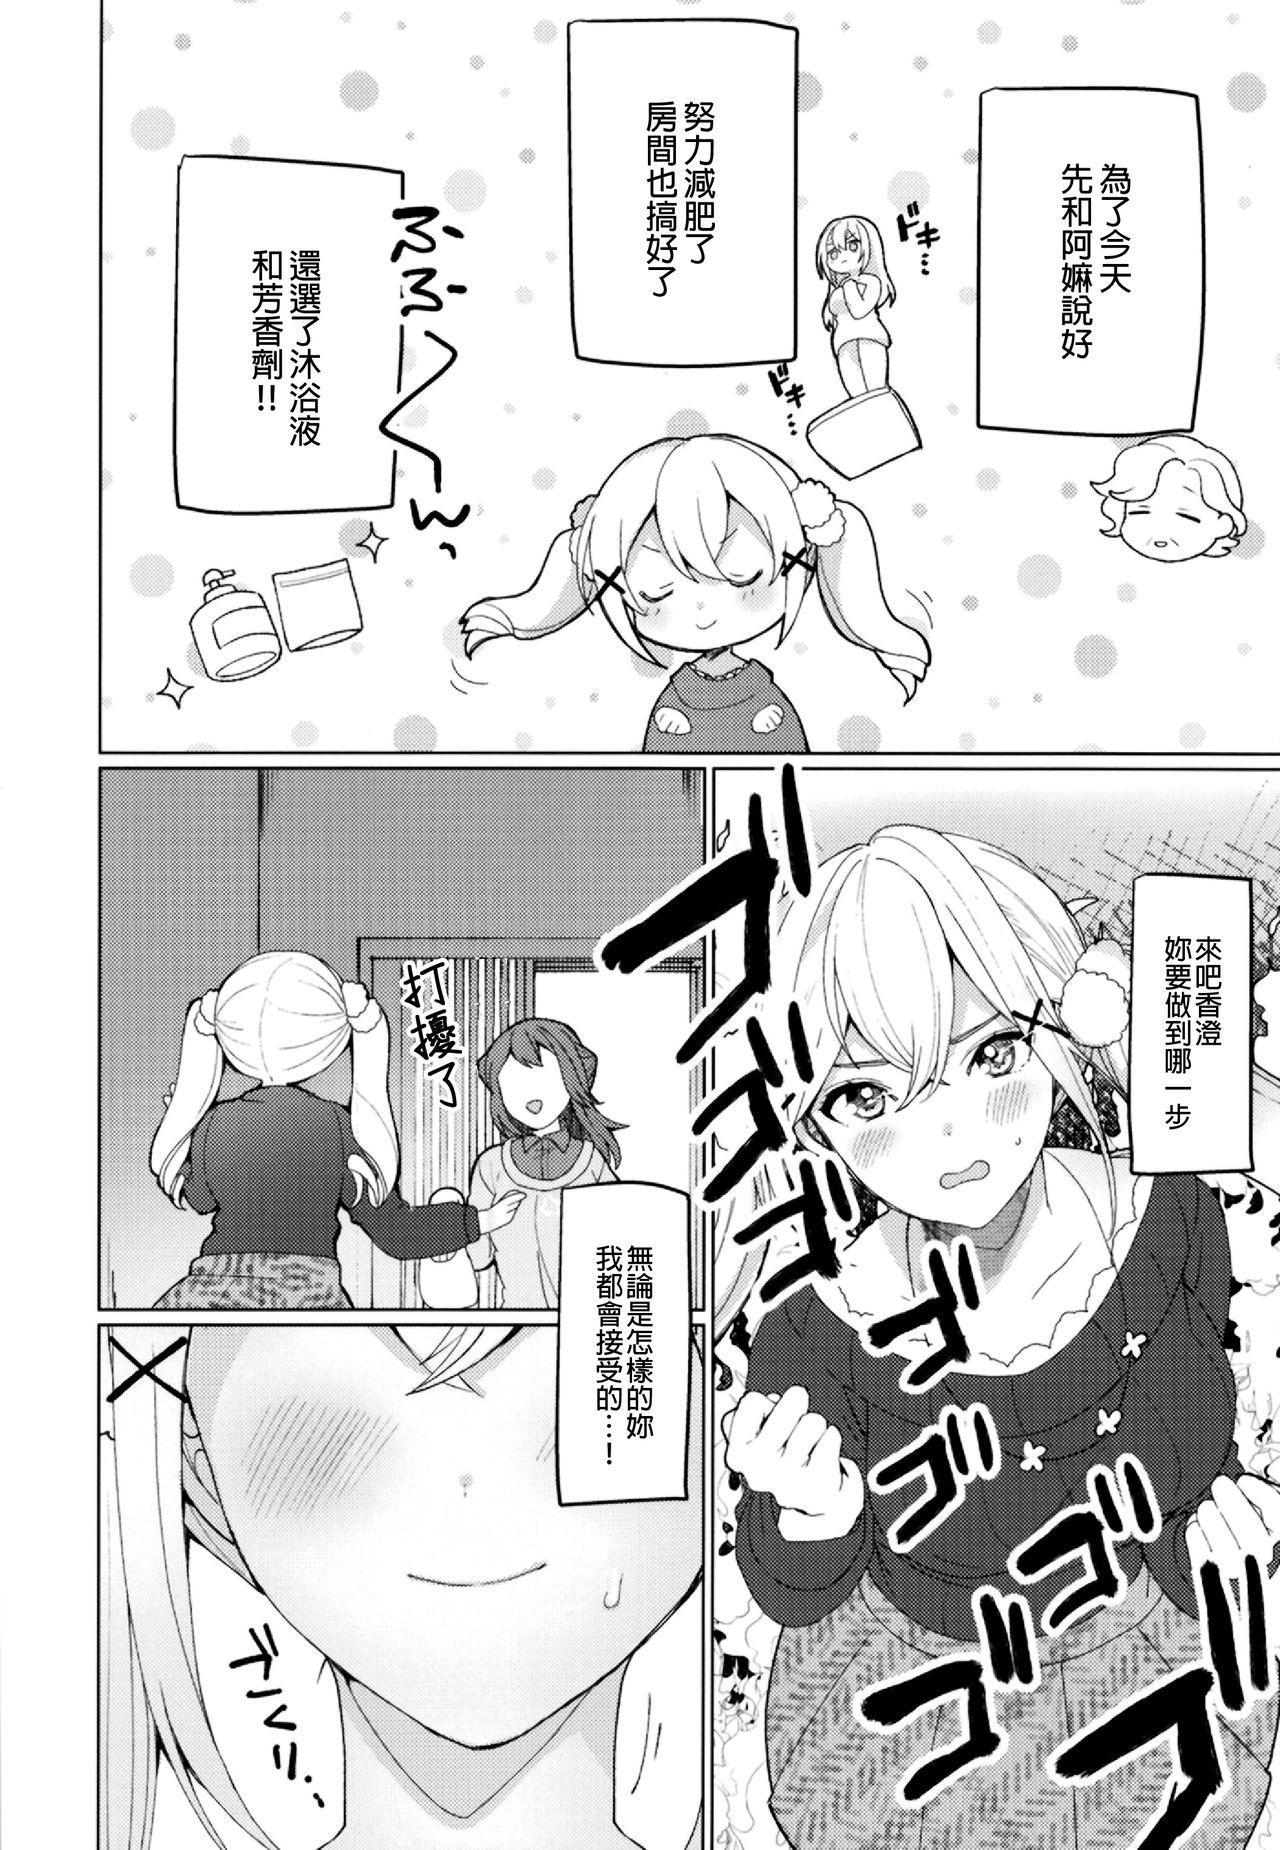 Kimi to Kirakira | 與妳閃閃發光 4